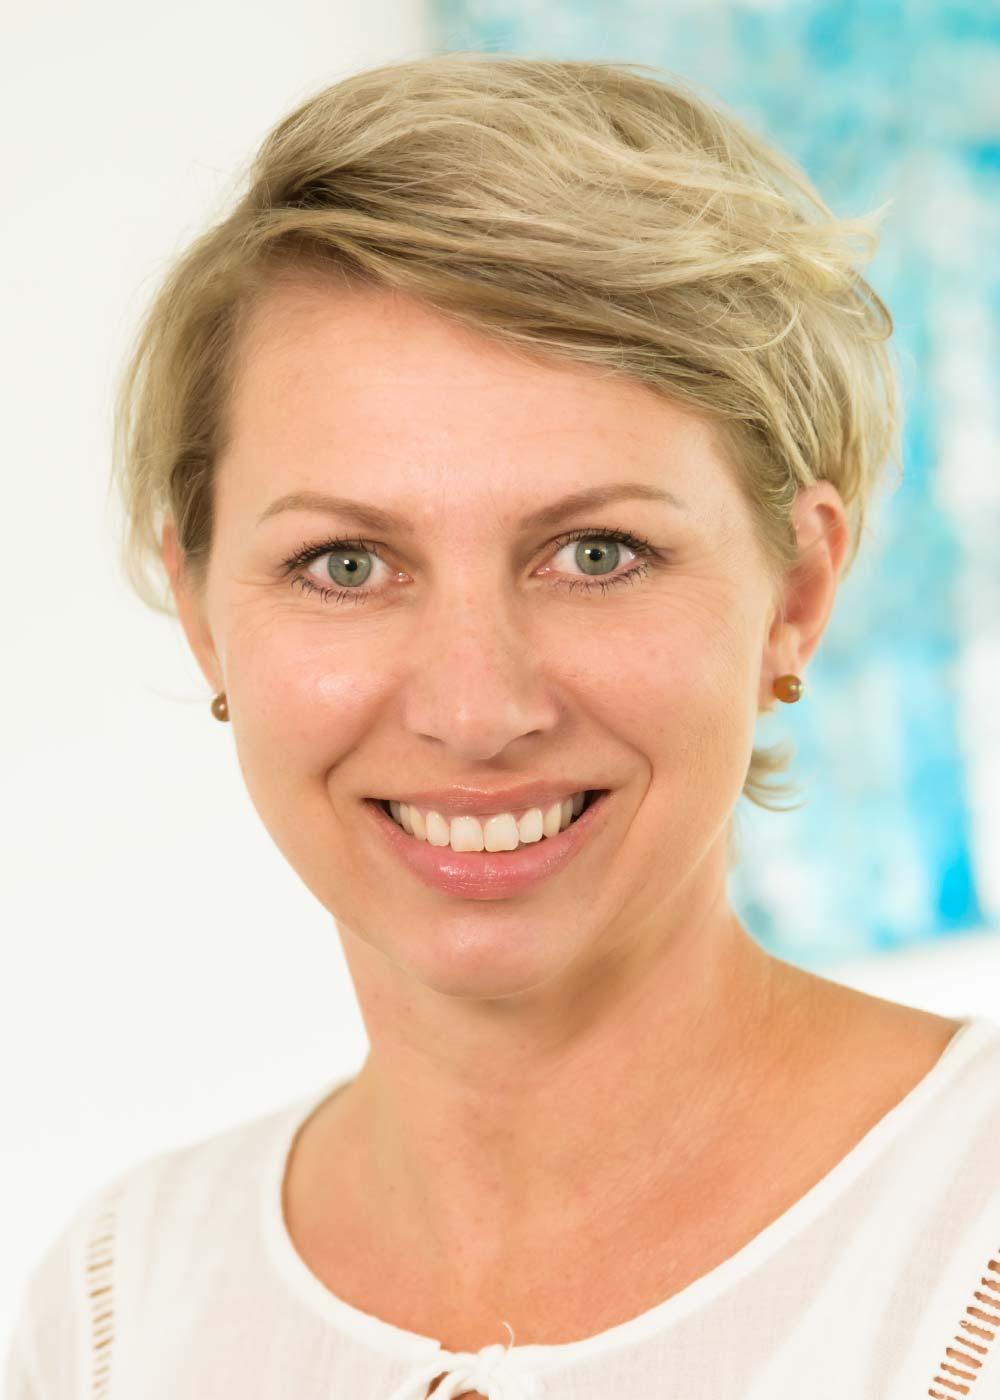 Silvia Mrowka